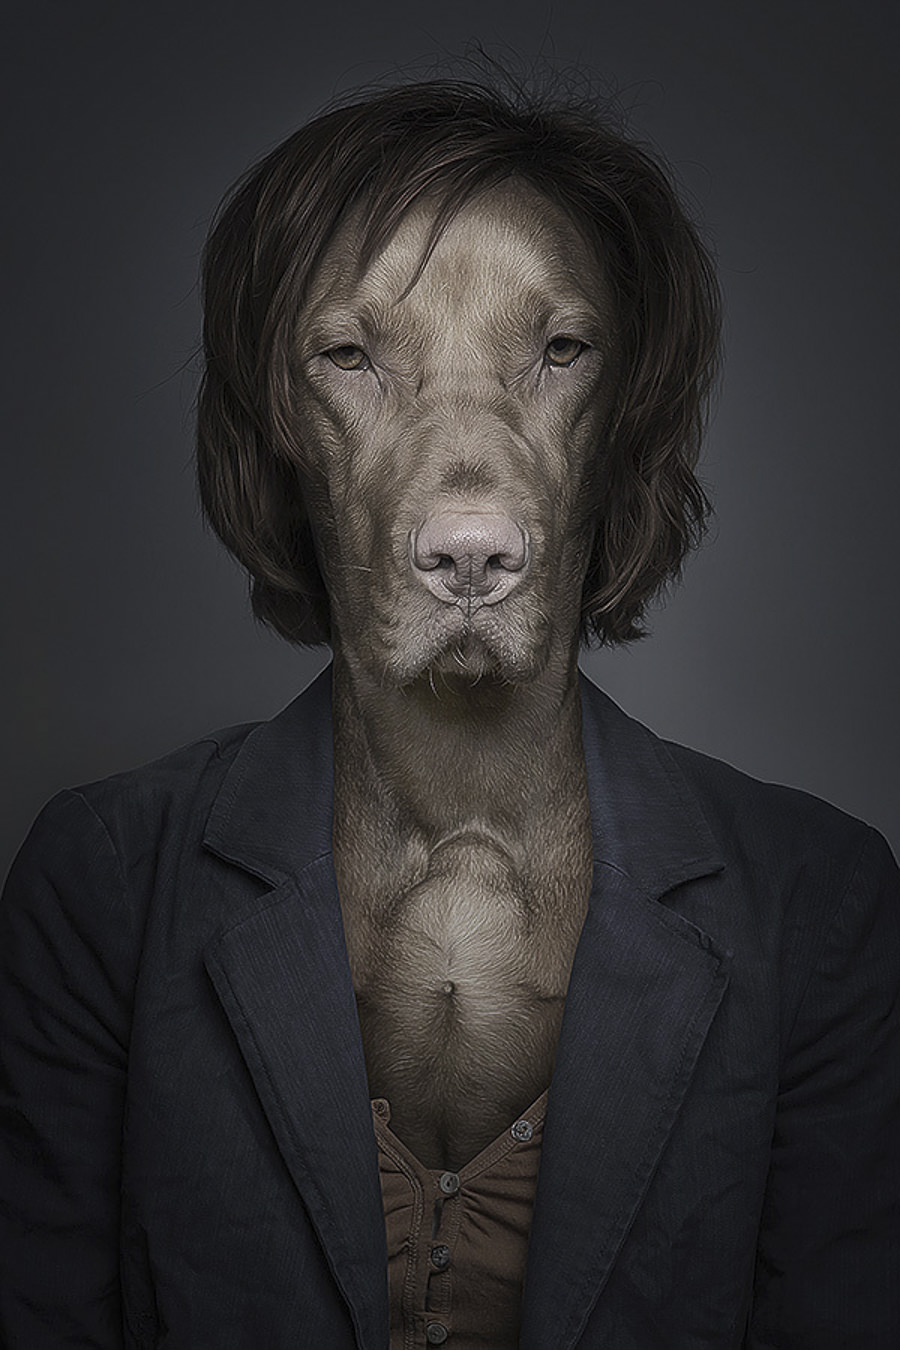 Underdogs by Sebastian Magnani